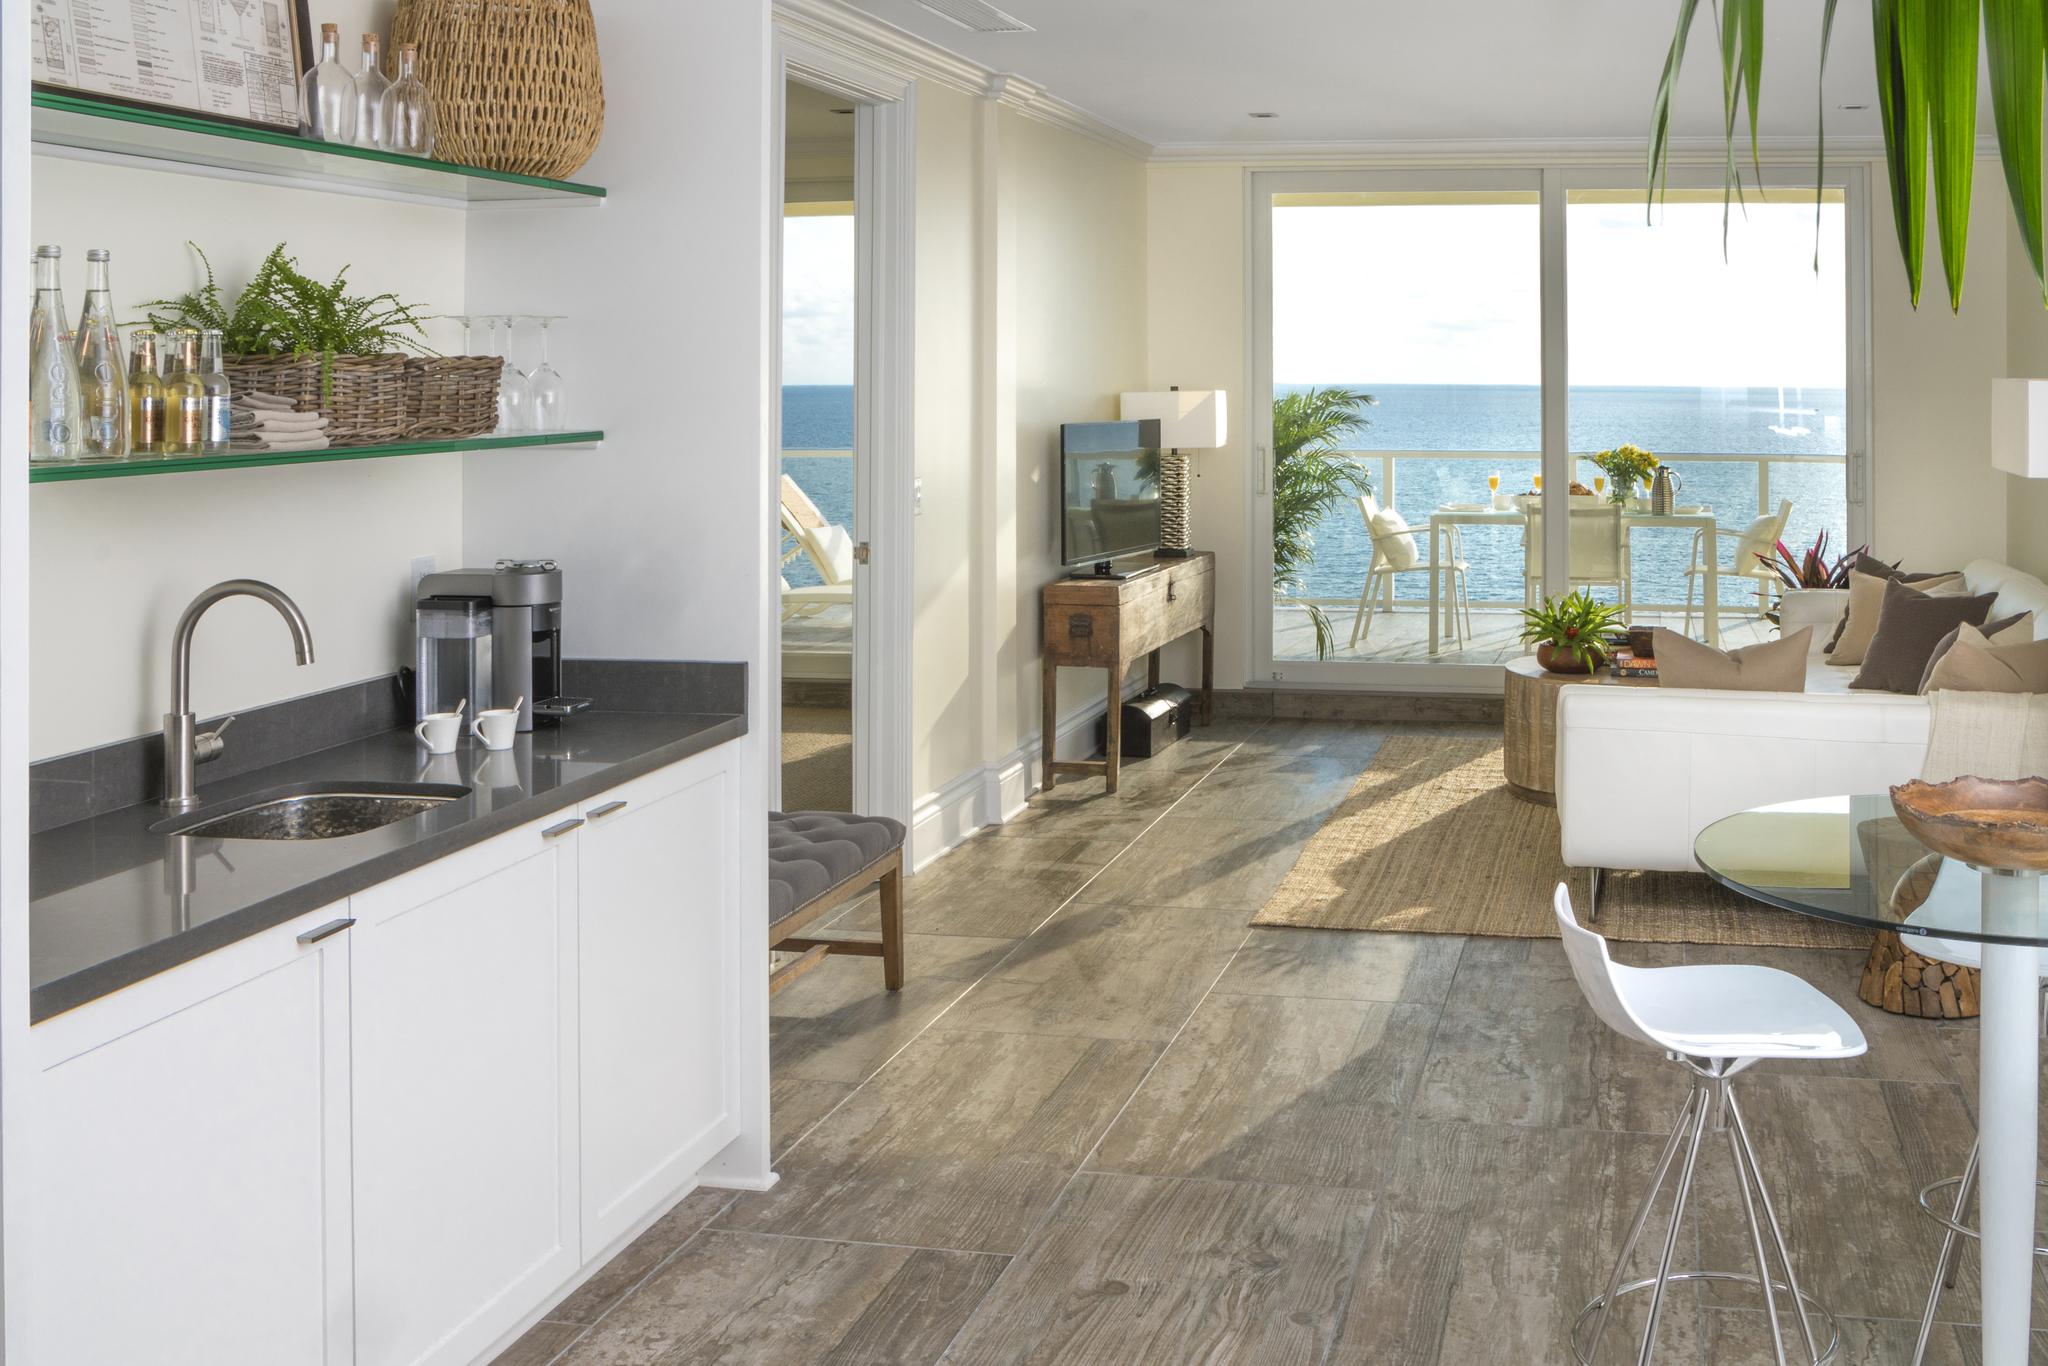 Ocean Suite Room with ocean view at Pelican Grand Beach Resort